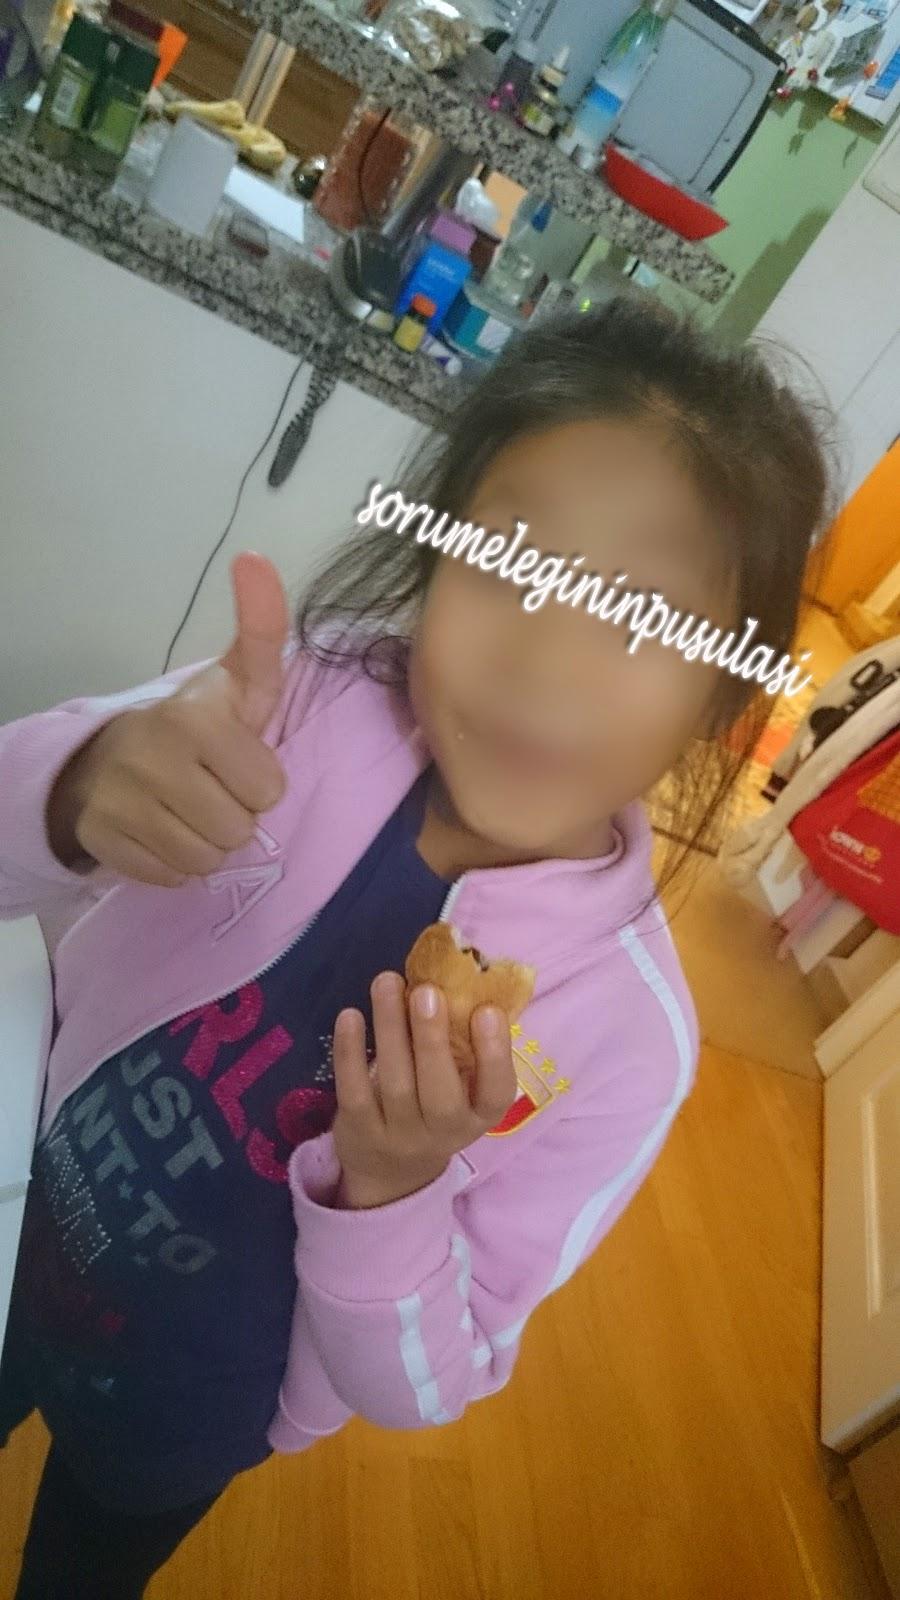 yemek-elvan-kruvasan-croissant- fikrimühim-today-todaycroissant-yemek-cikolata-chocalate-sorumelegininpusulasi-cocuk-kid